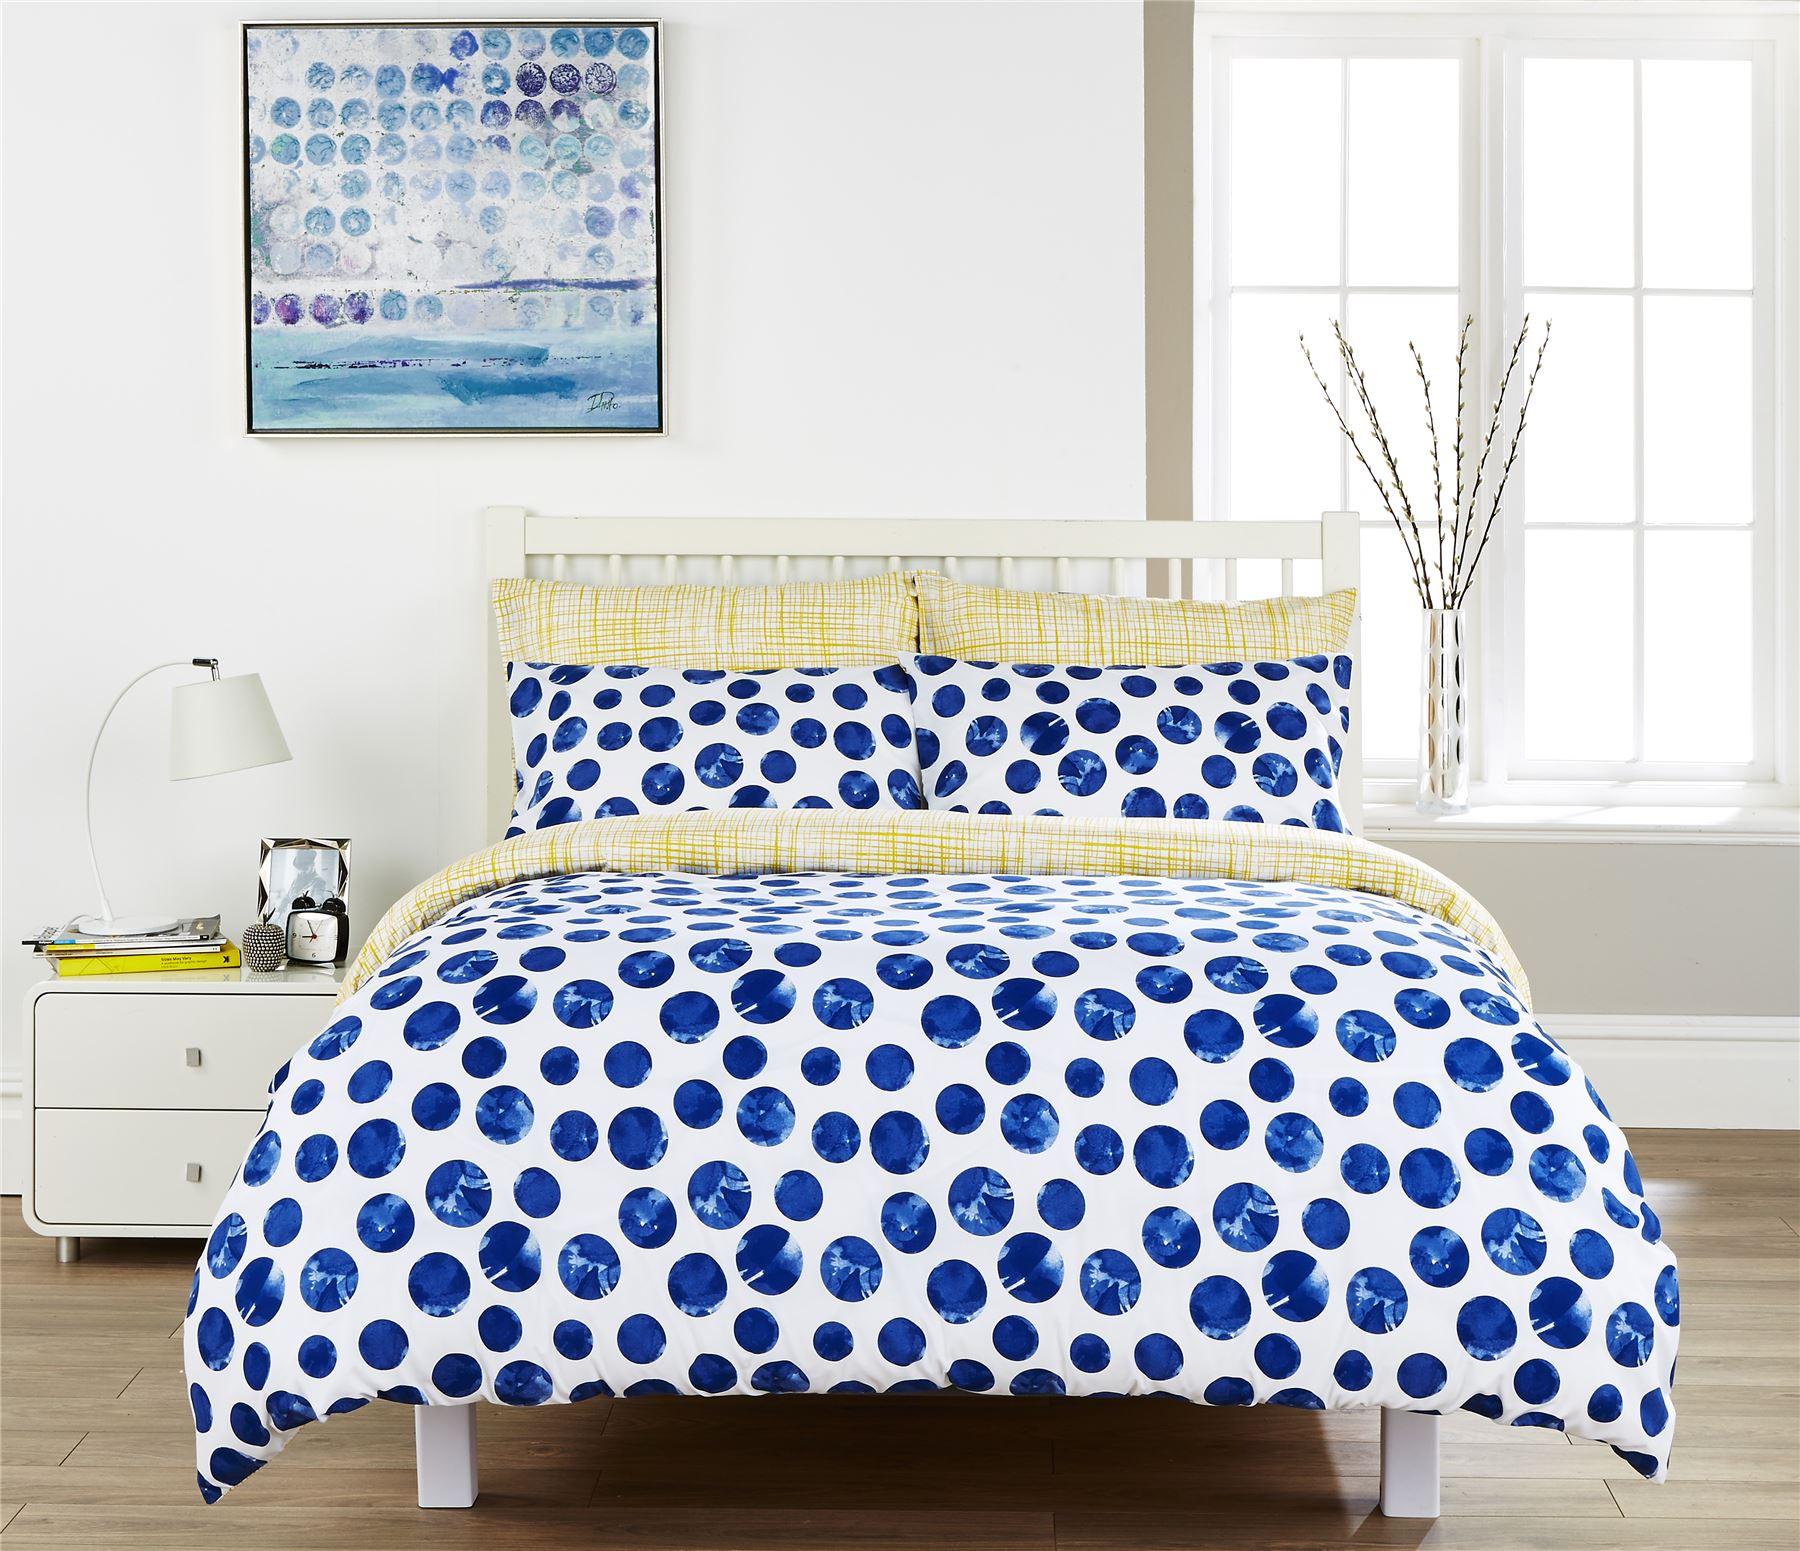 MODERN Reversible NAVY BLUE and WHITE 300tc Cotton BEDDING DUVET COVER SET